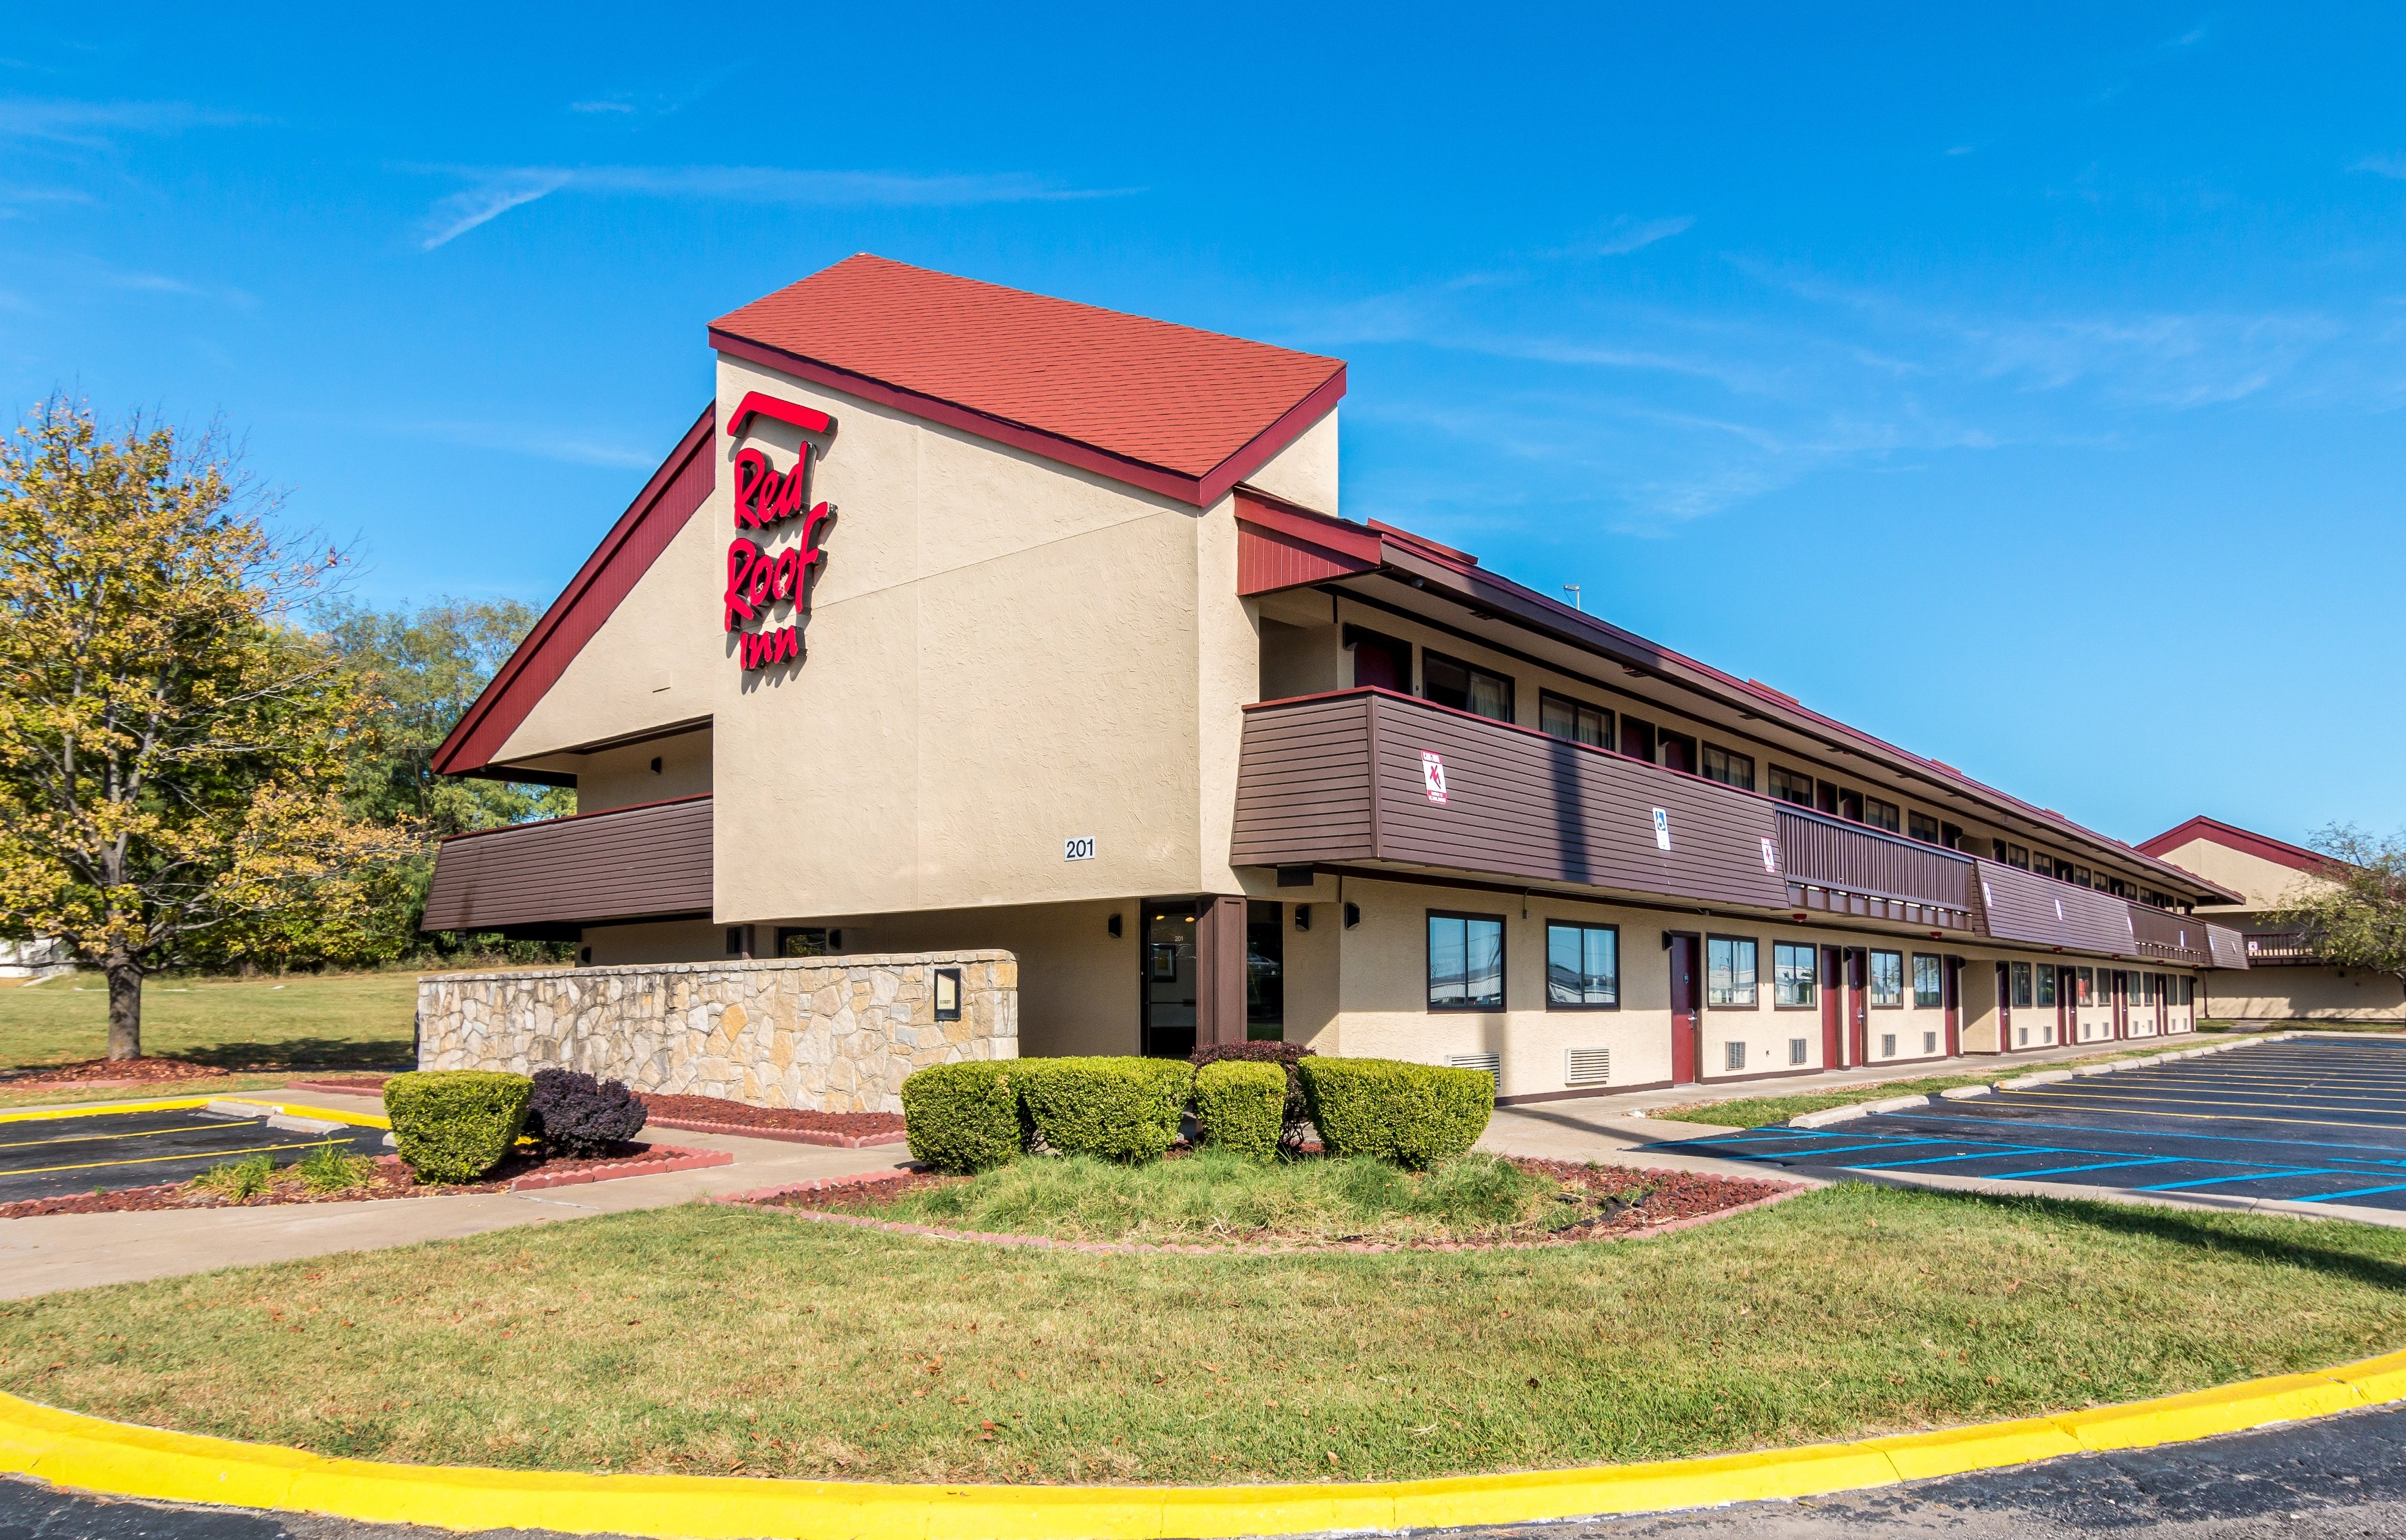 Red Roof Inn Columbia, MO